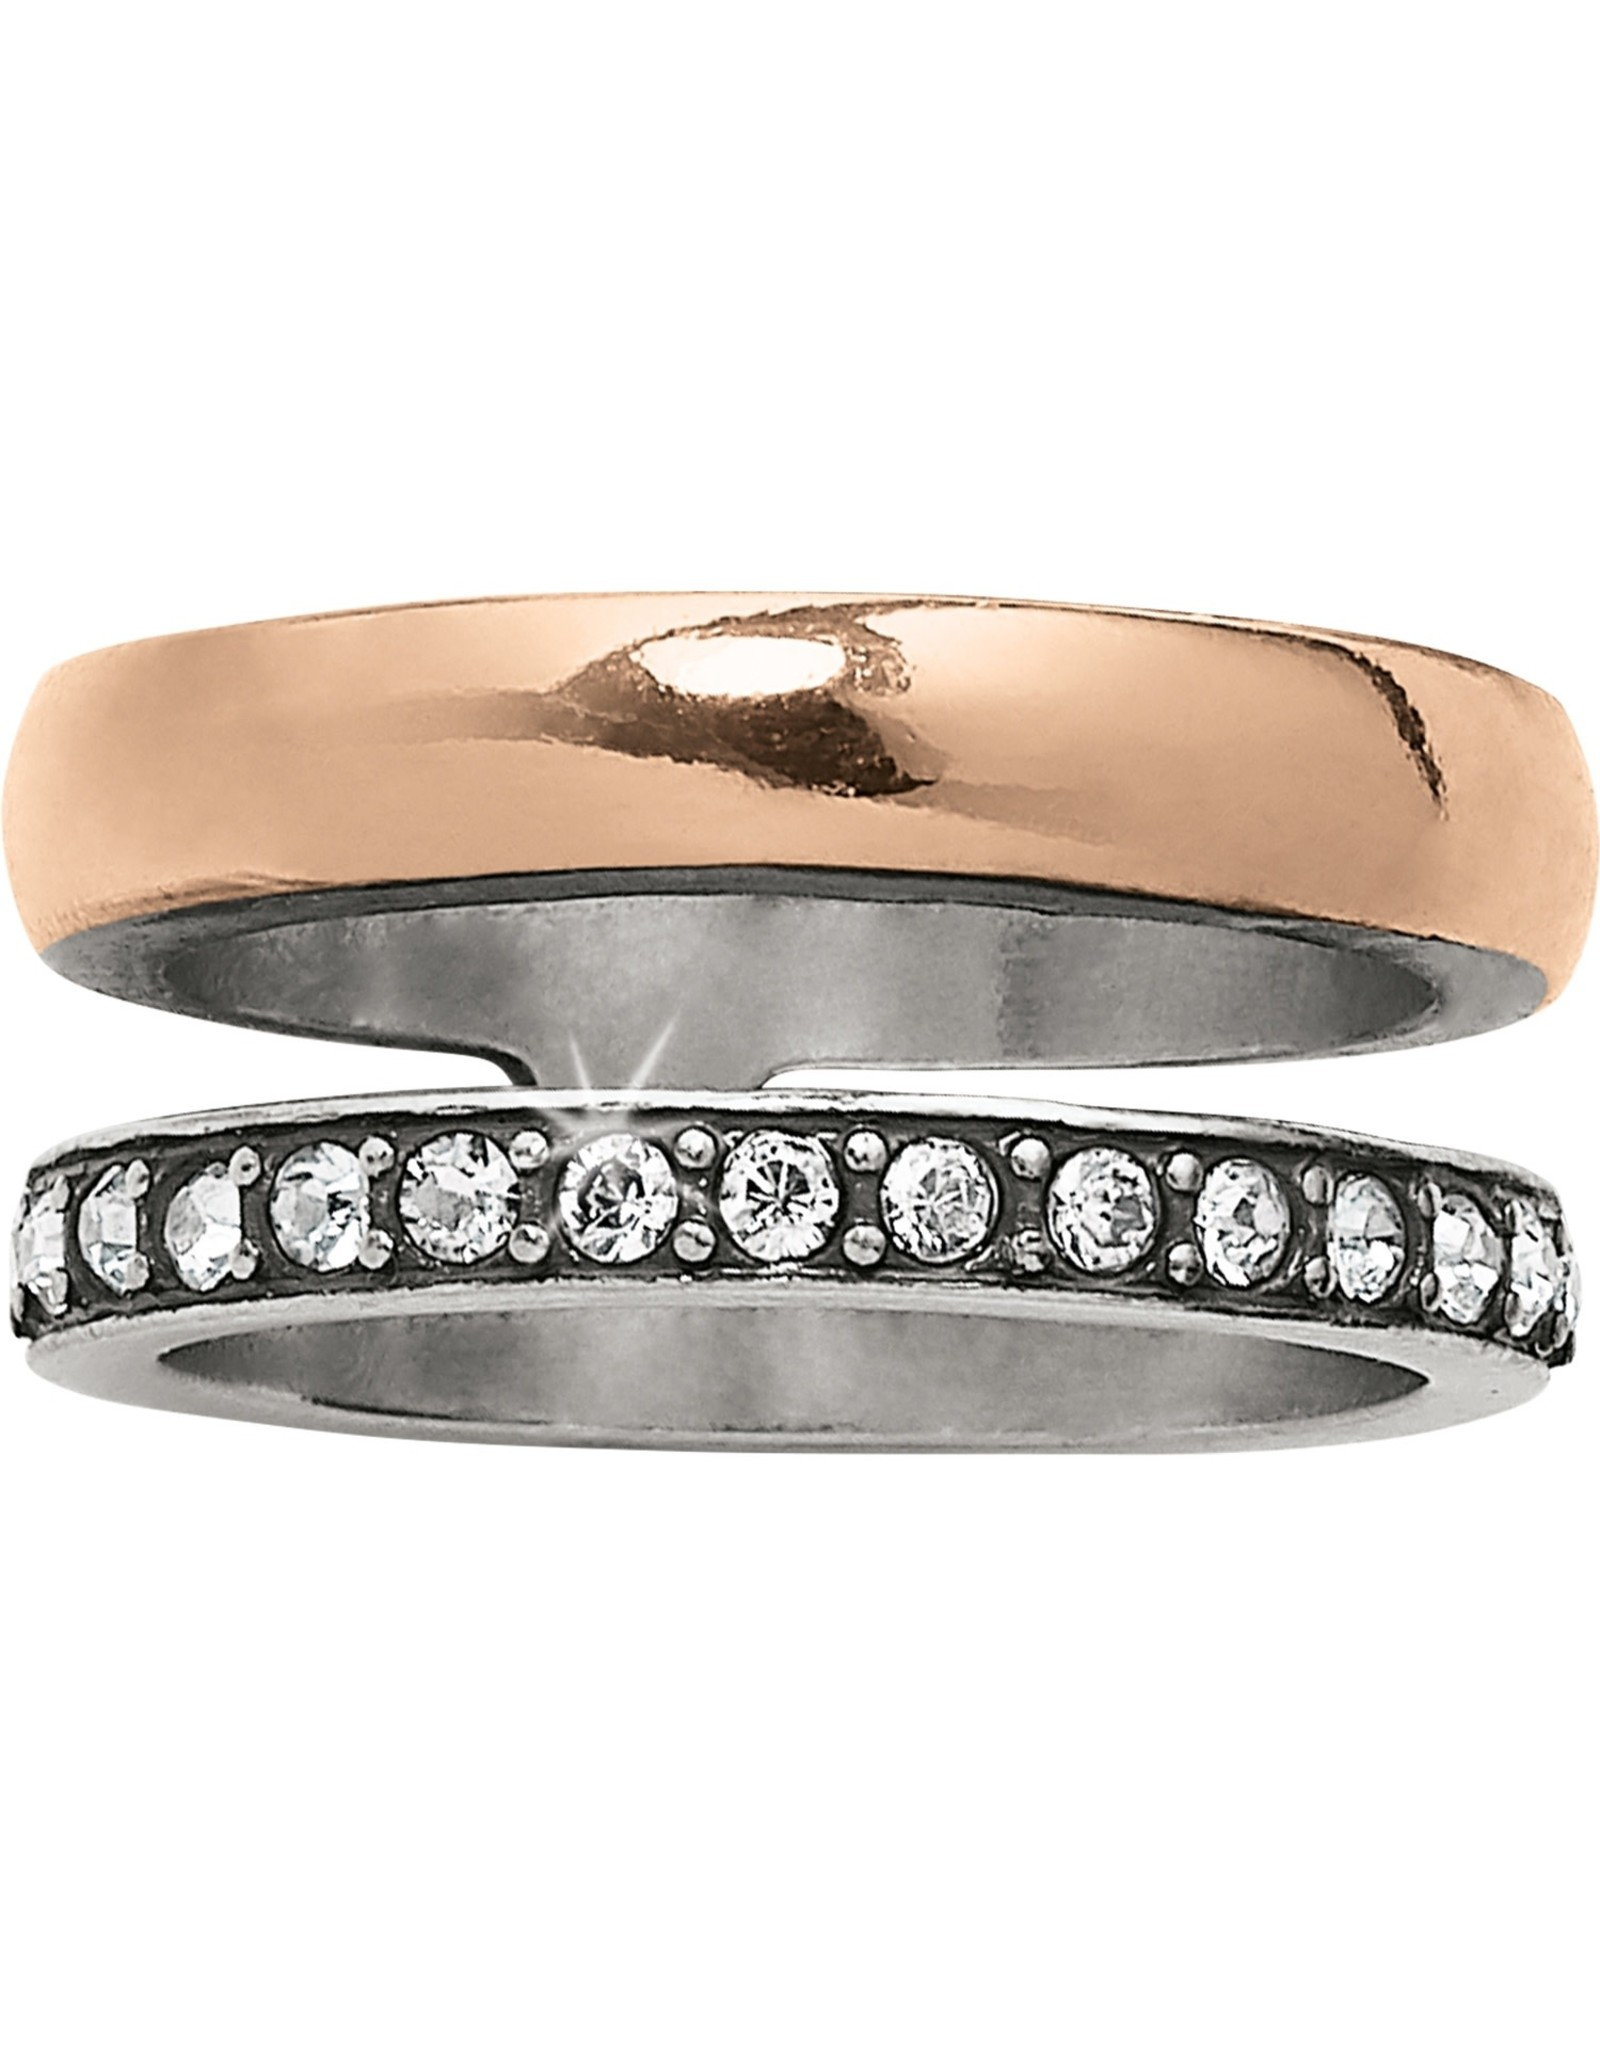 Brighton Neptunes Rings Duo Ring Size 9